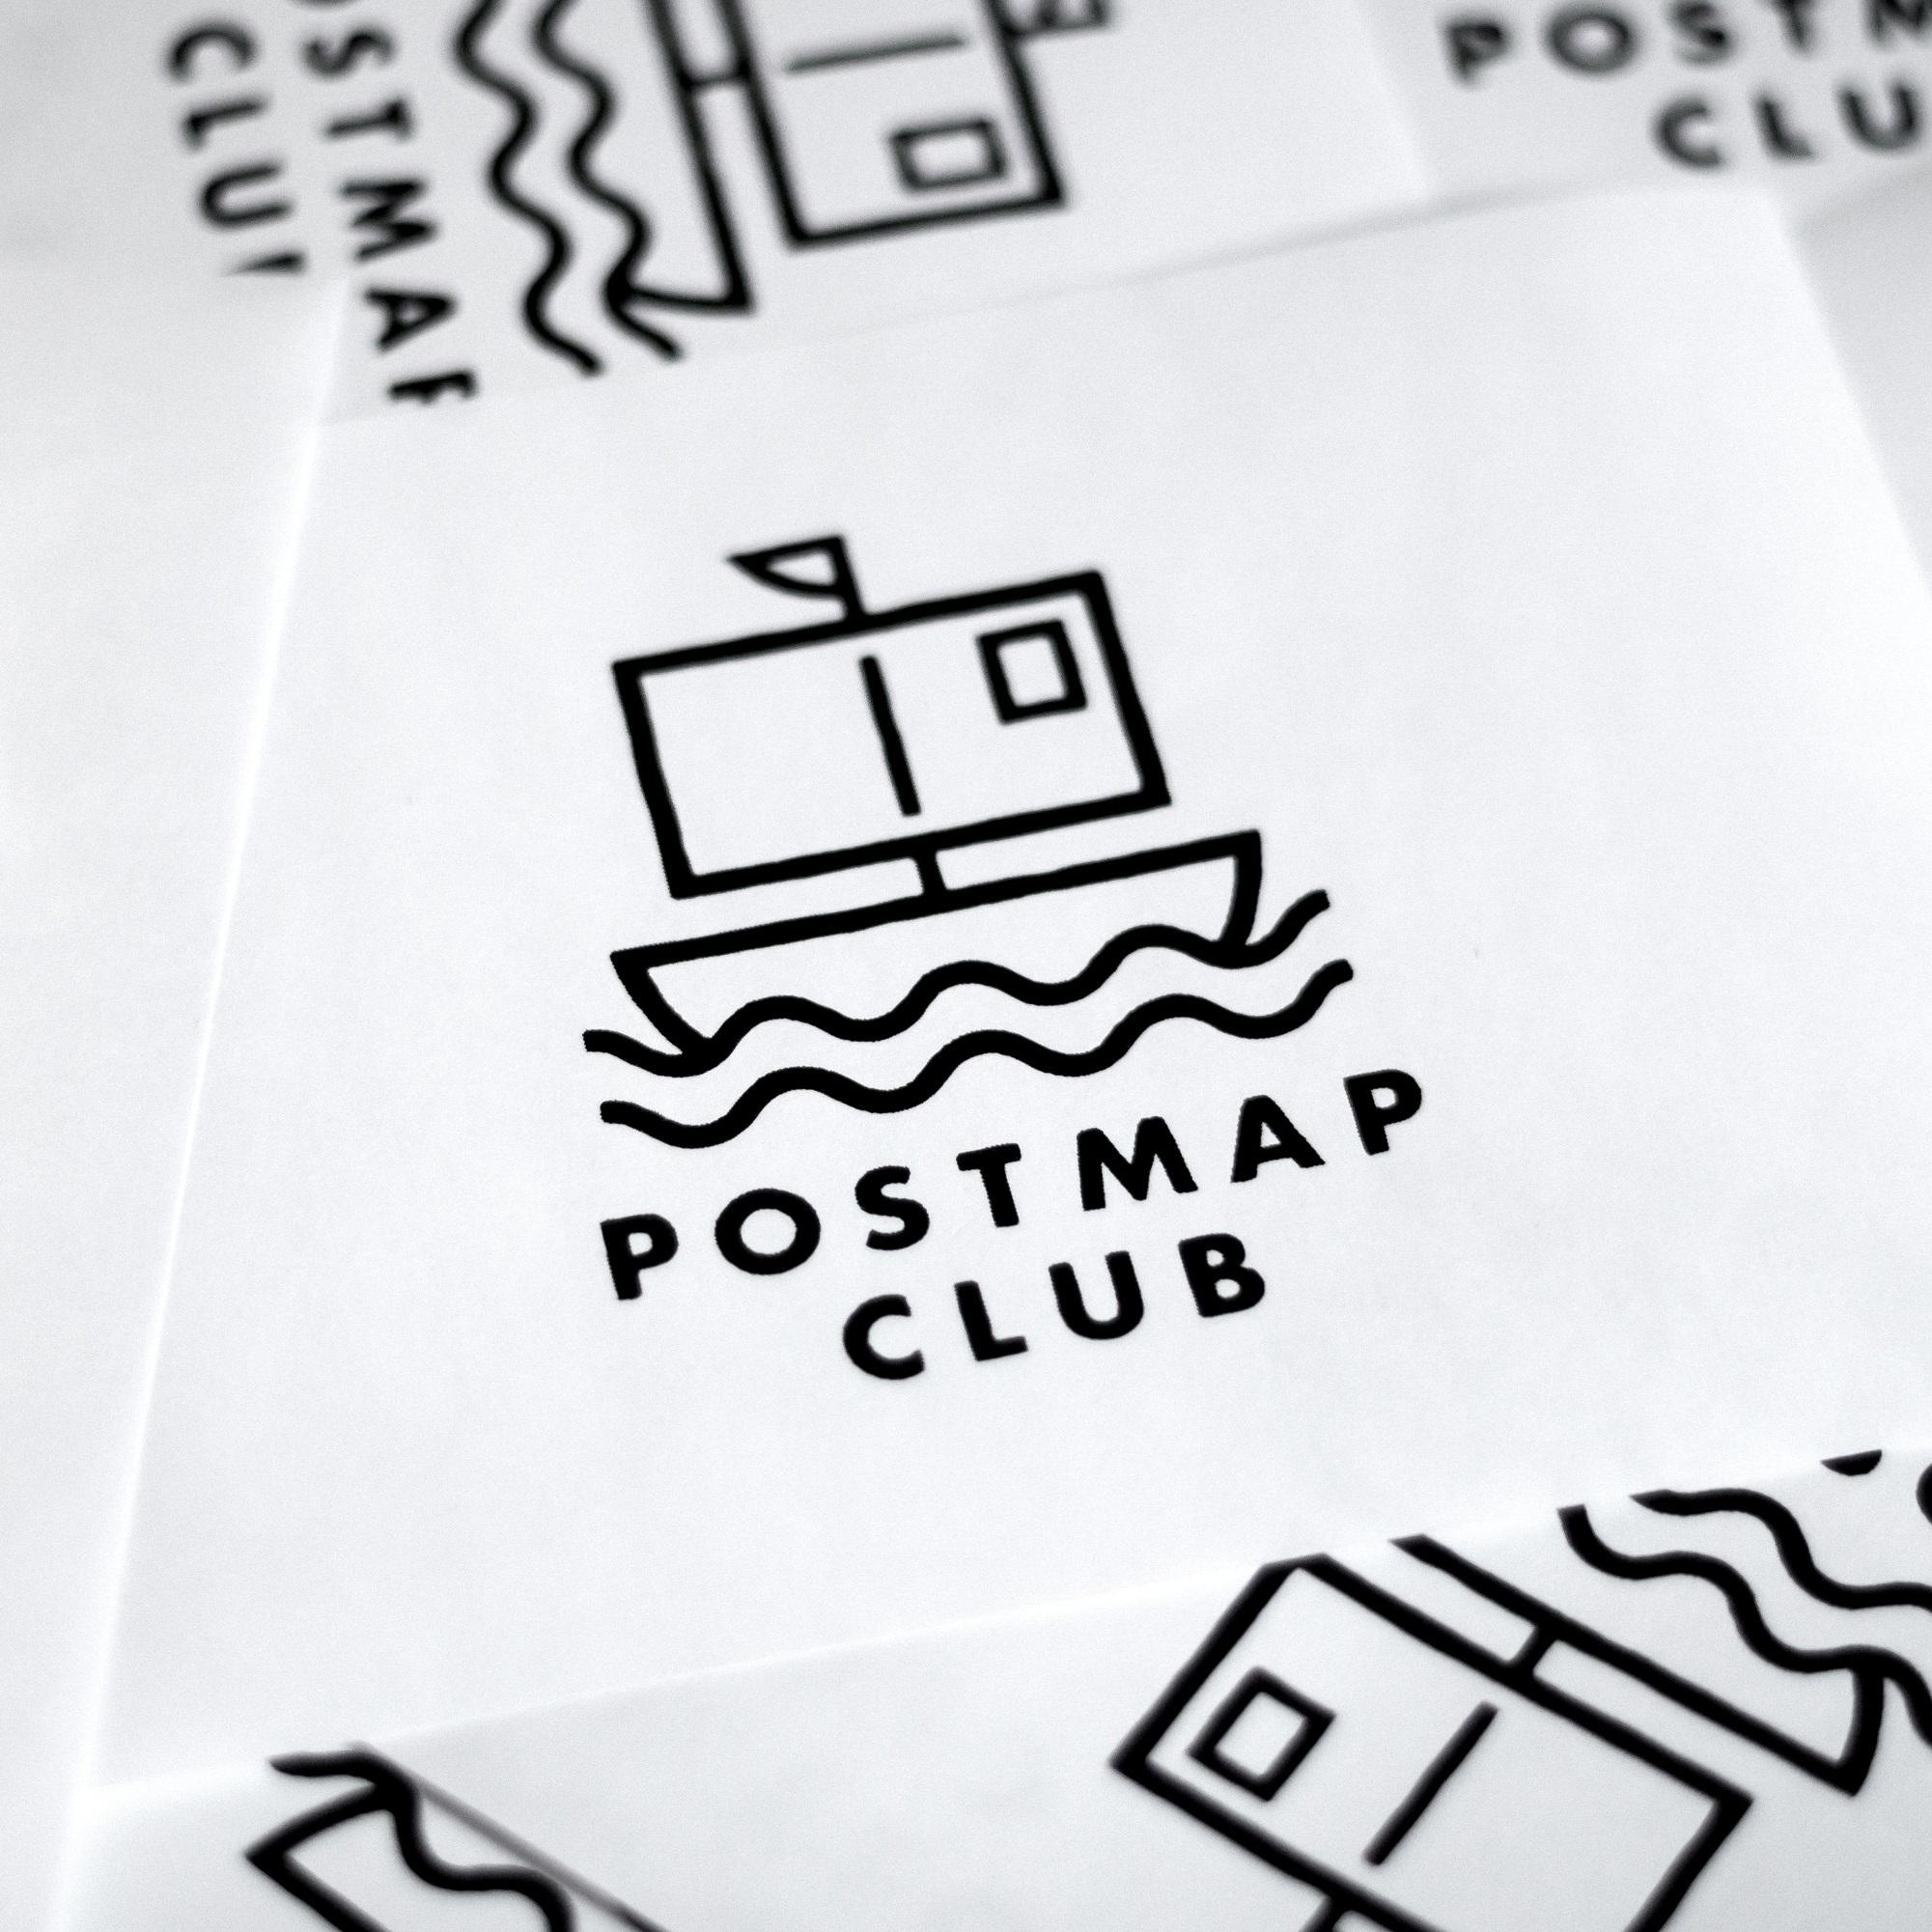 postmap-photo-01.jpg